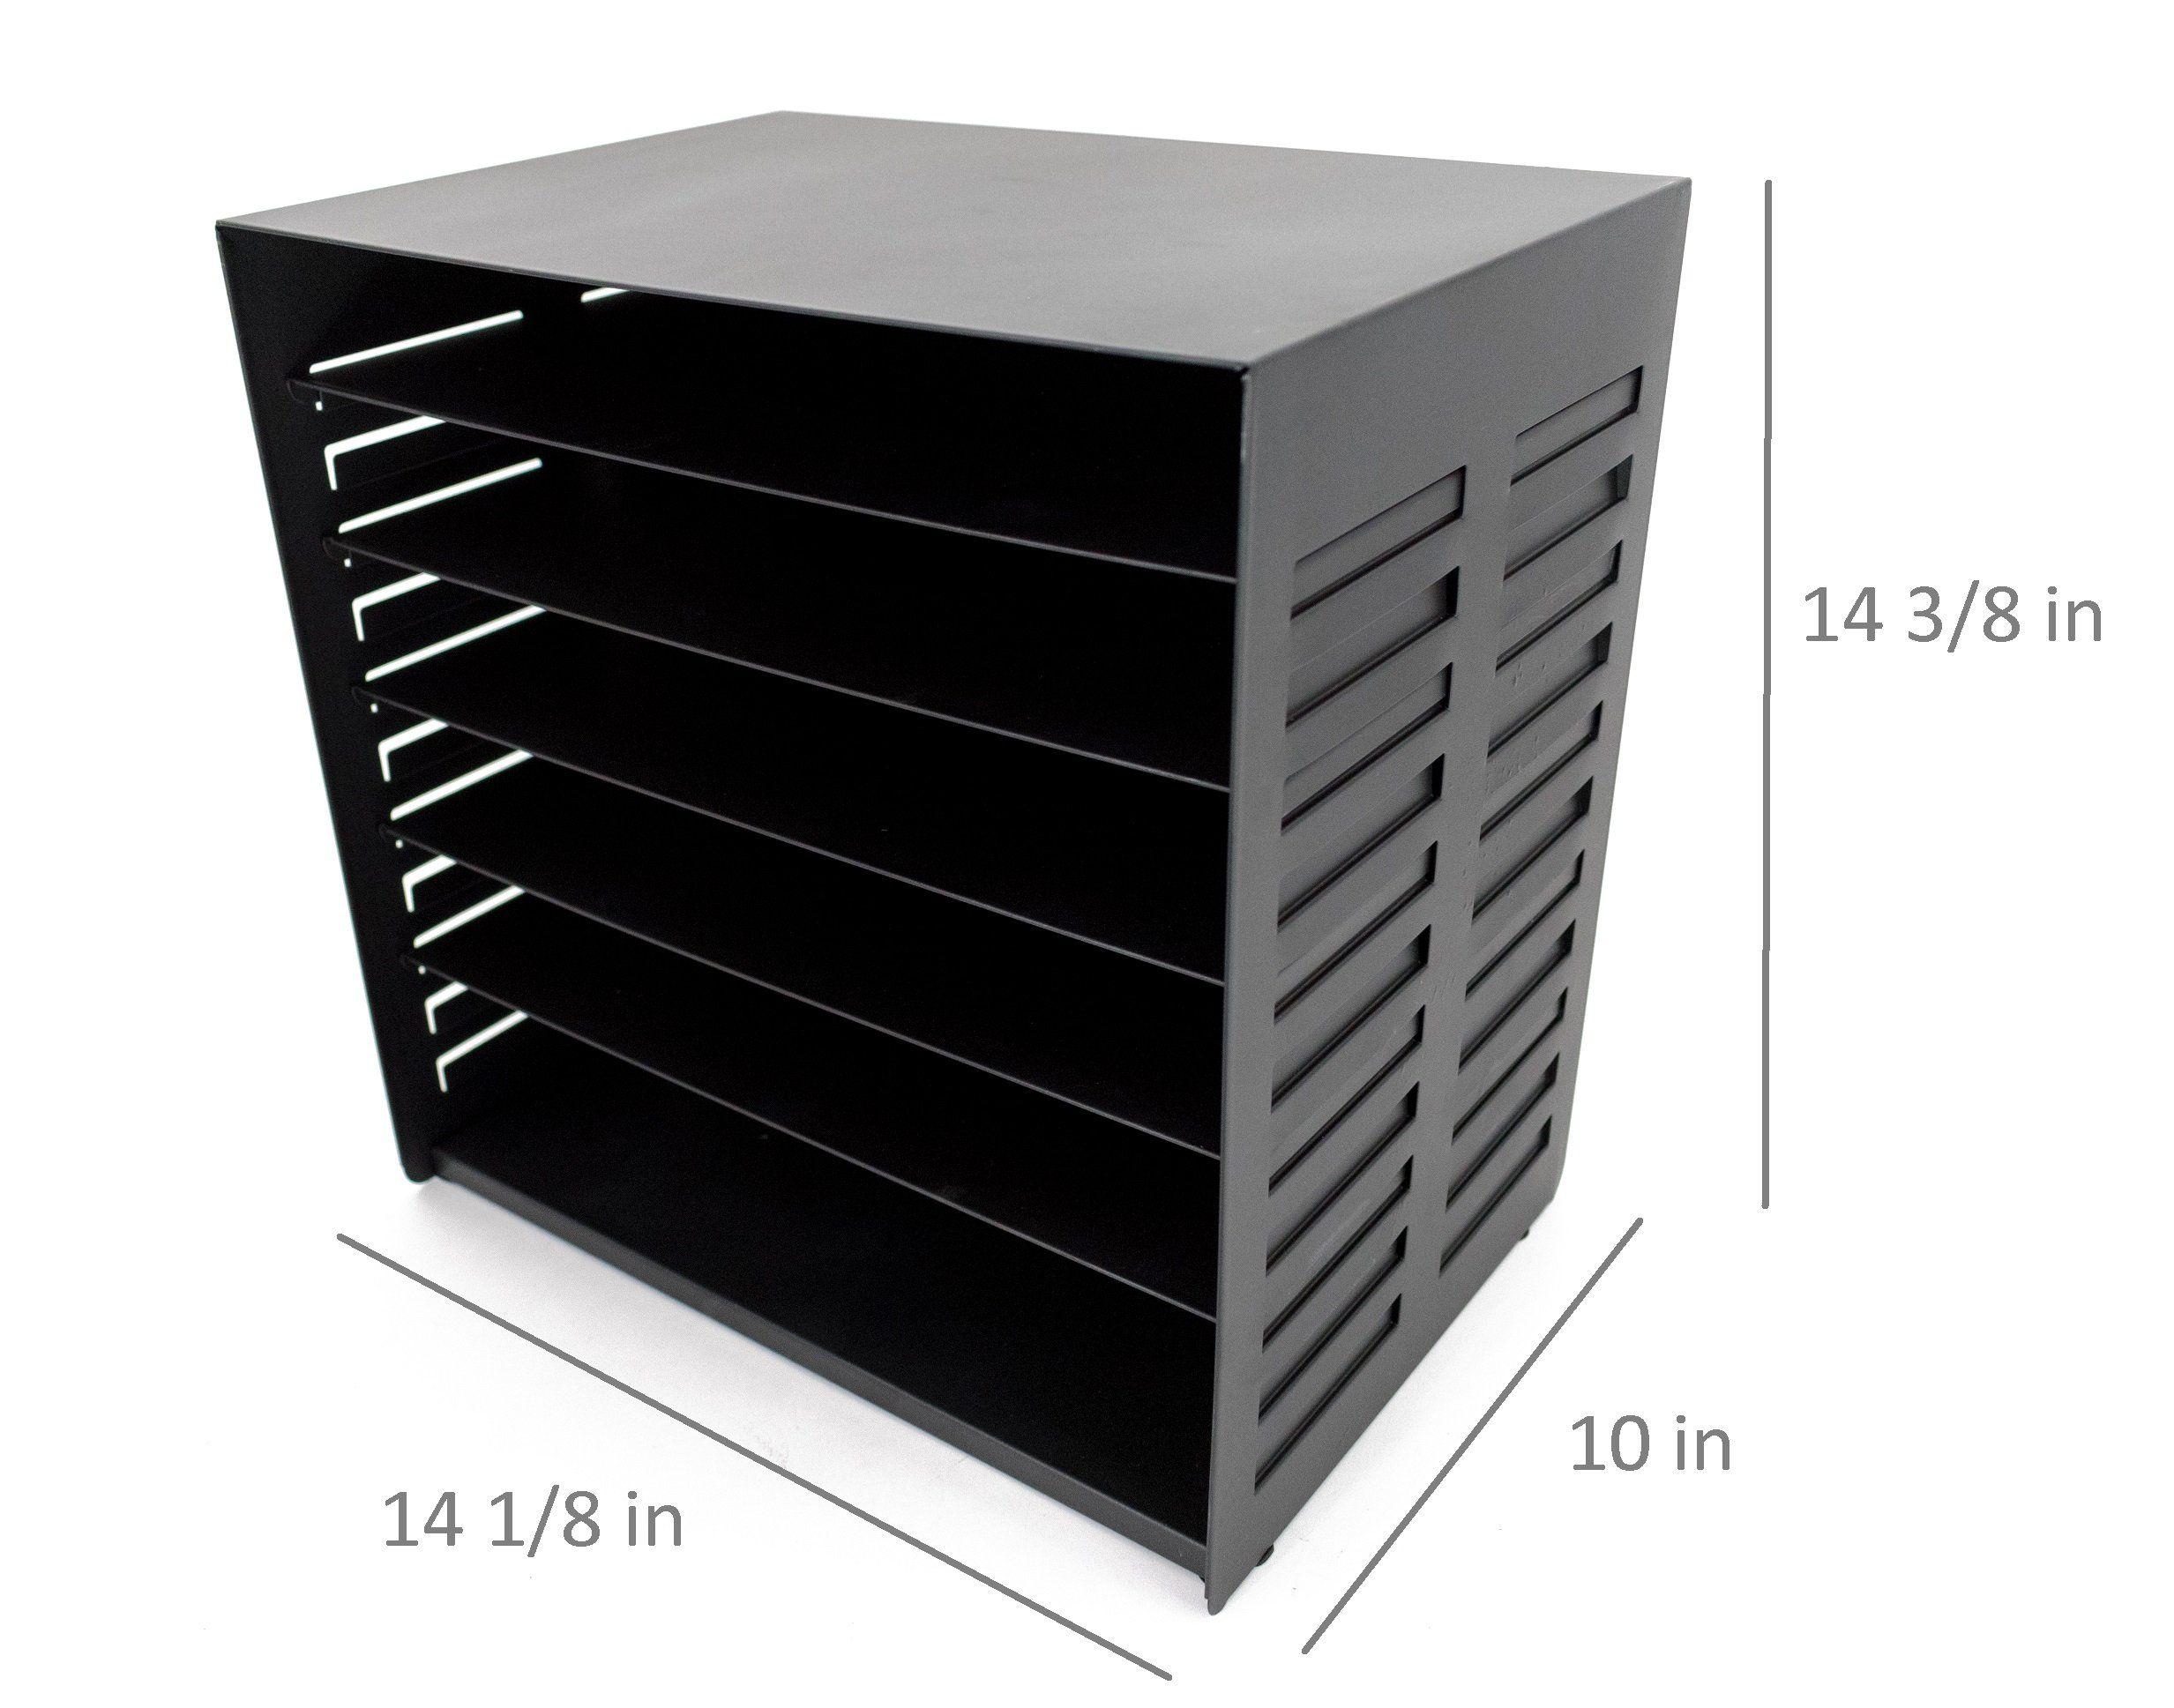 Blu Monaco 6 Tier Vertical Trays Document File Holder Office Desktop Sorter Rack Adjustable Shelves Black Metal Teal Desk Adjustable Shelving Office Desktop